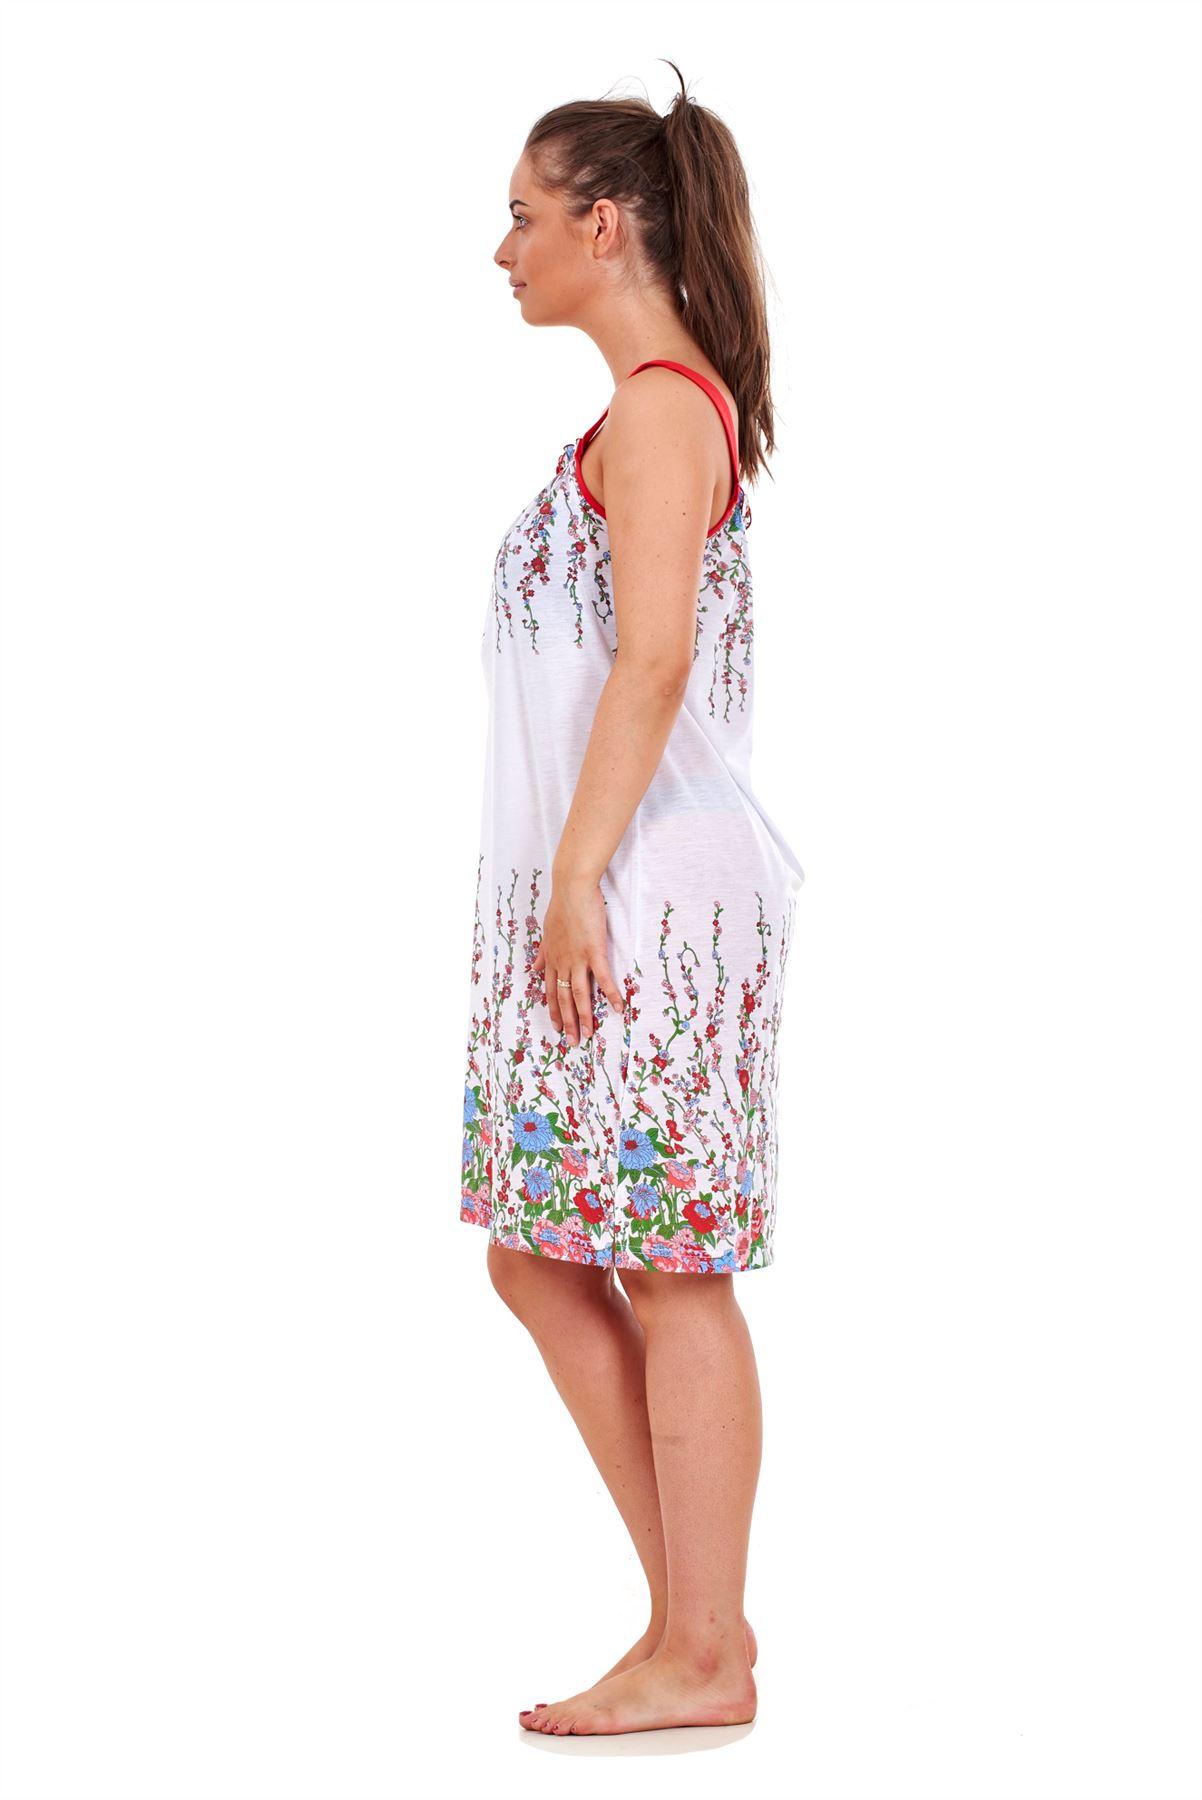 7771f6765a Ladies Sleeveless Nightwear Floral 100% Cotton Summer Short ...